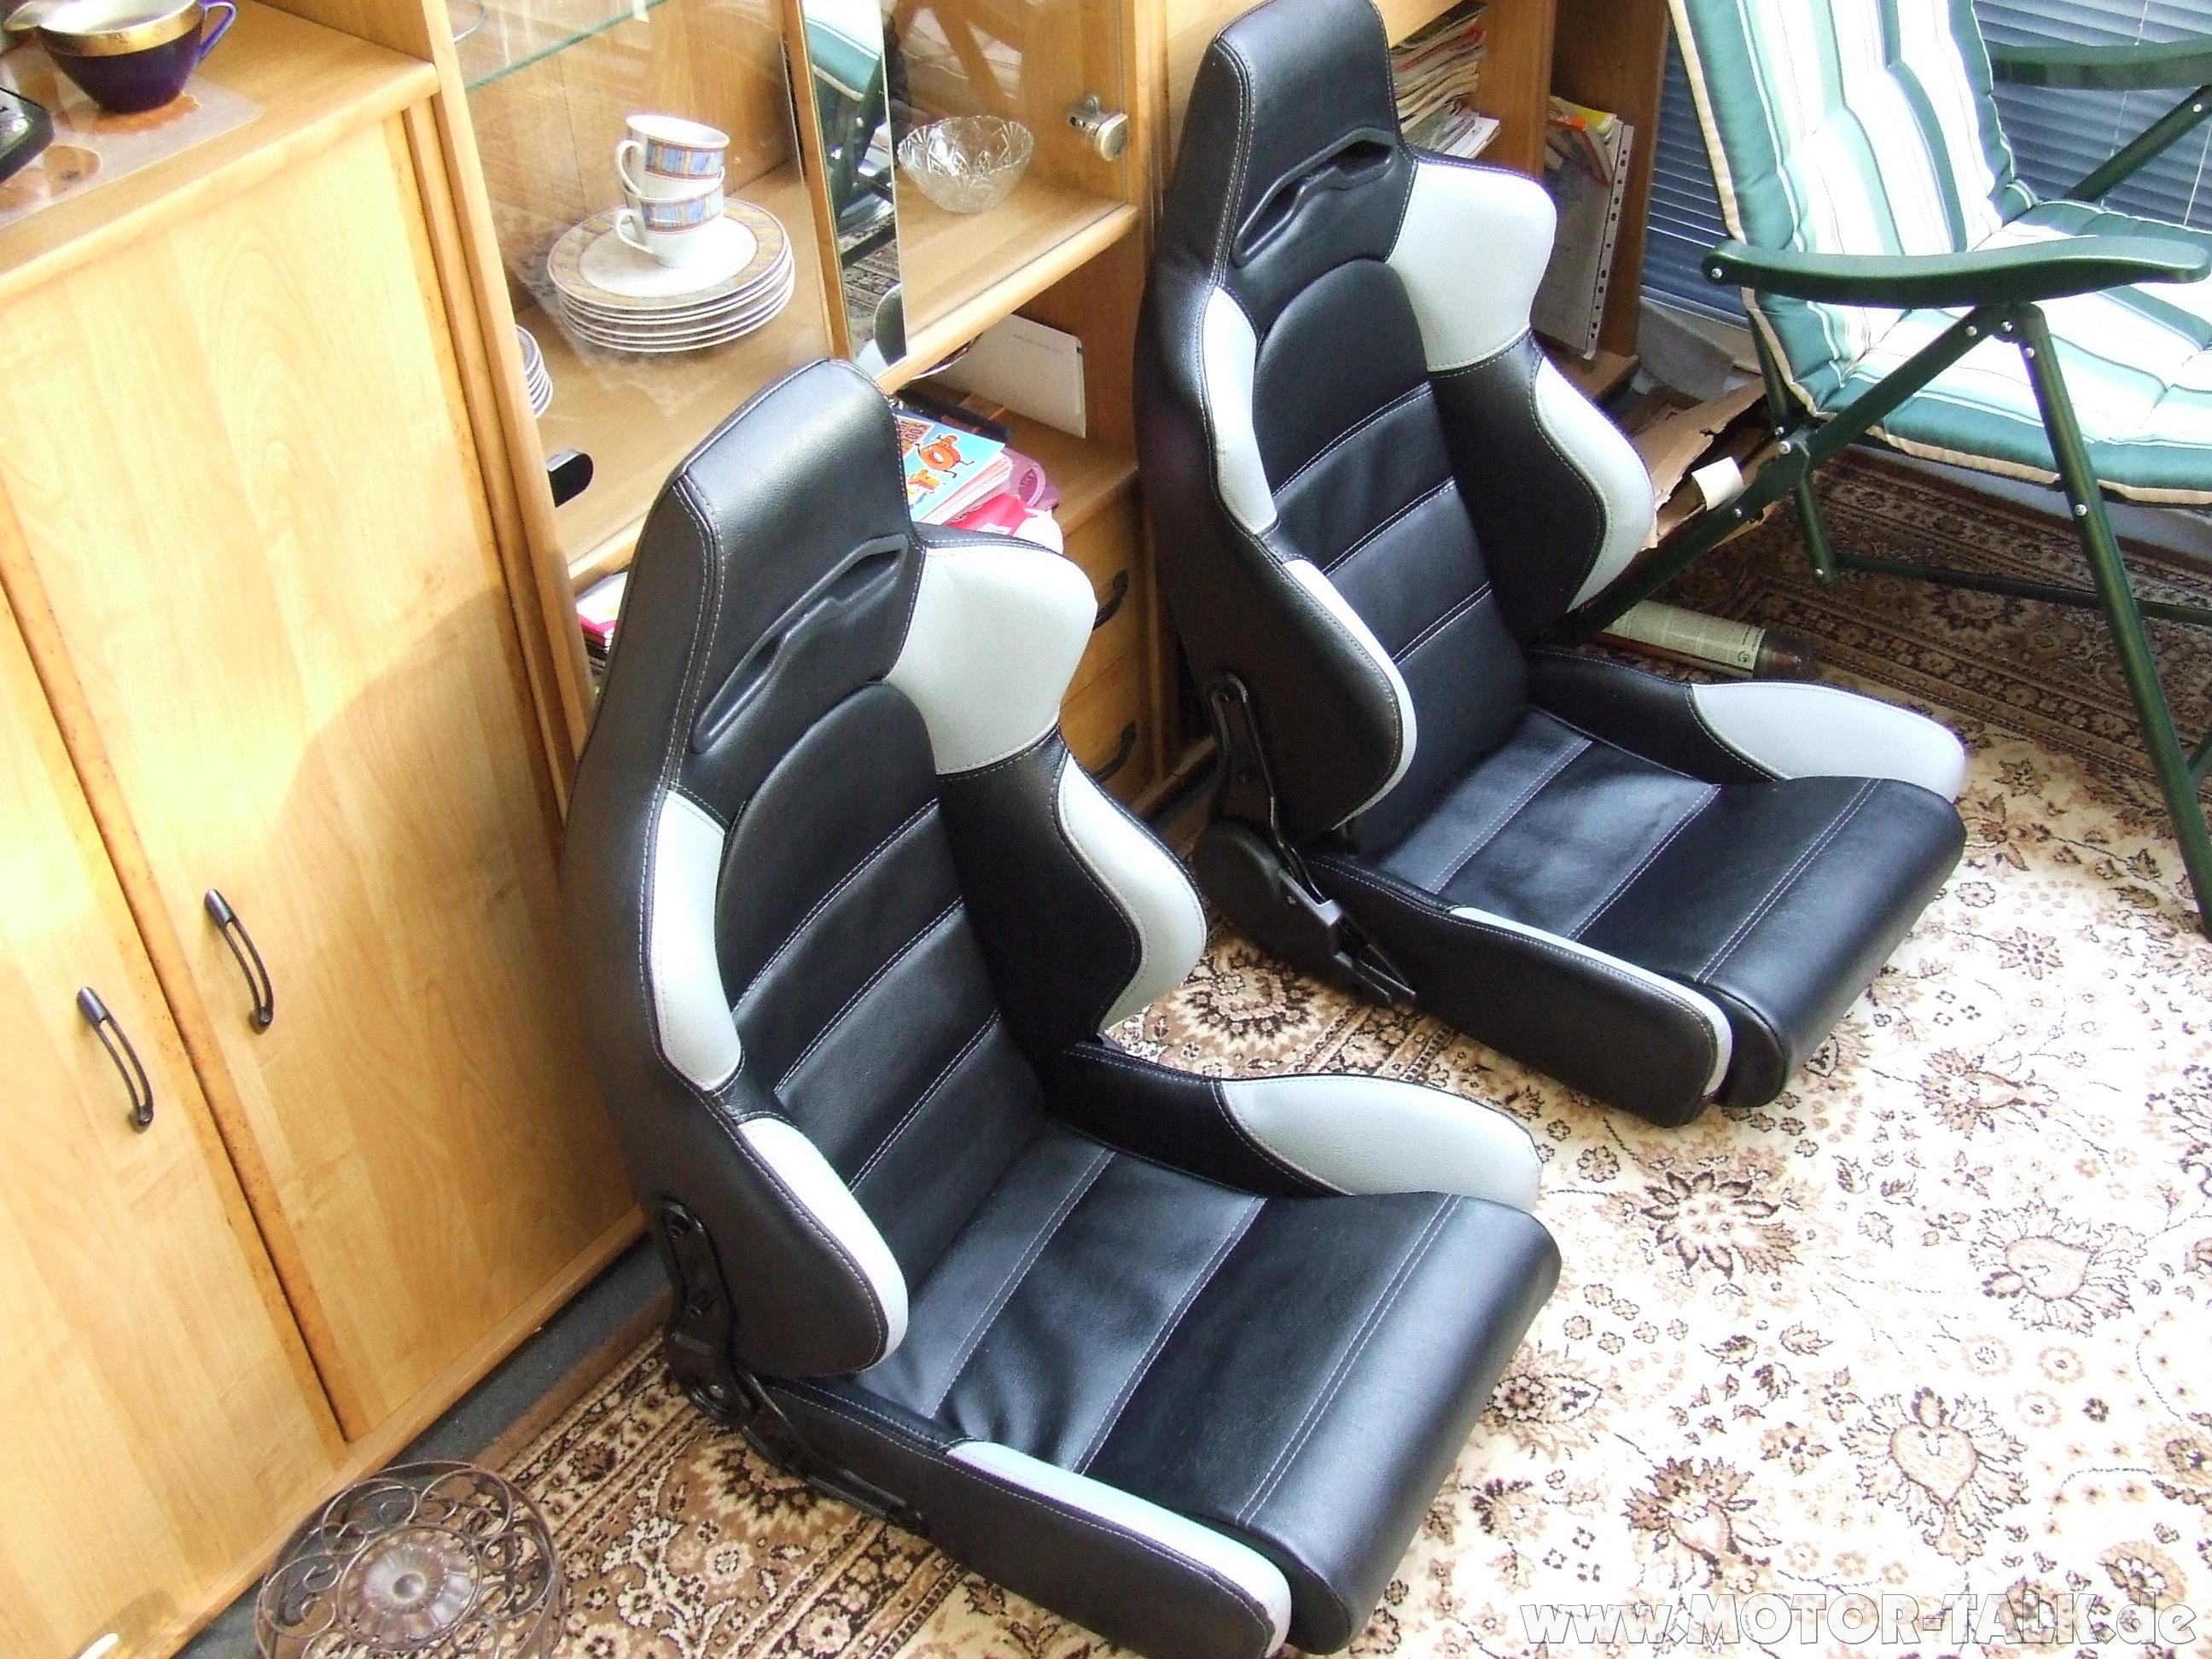 sitze sportsitze bmw 3er e36 203159167. Black Bedroom Furniture Sets. Home Design Ideas